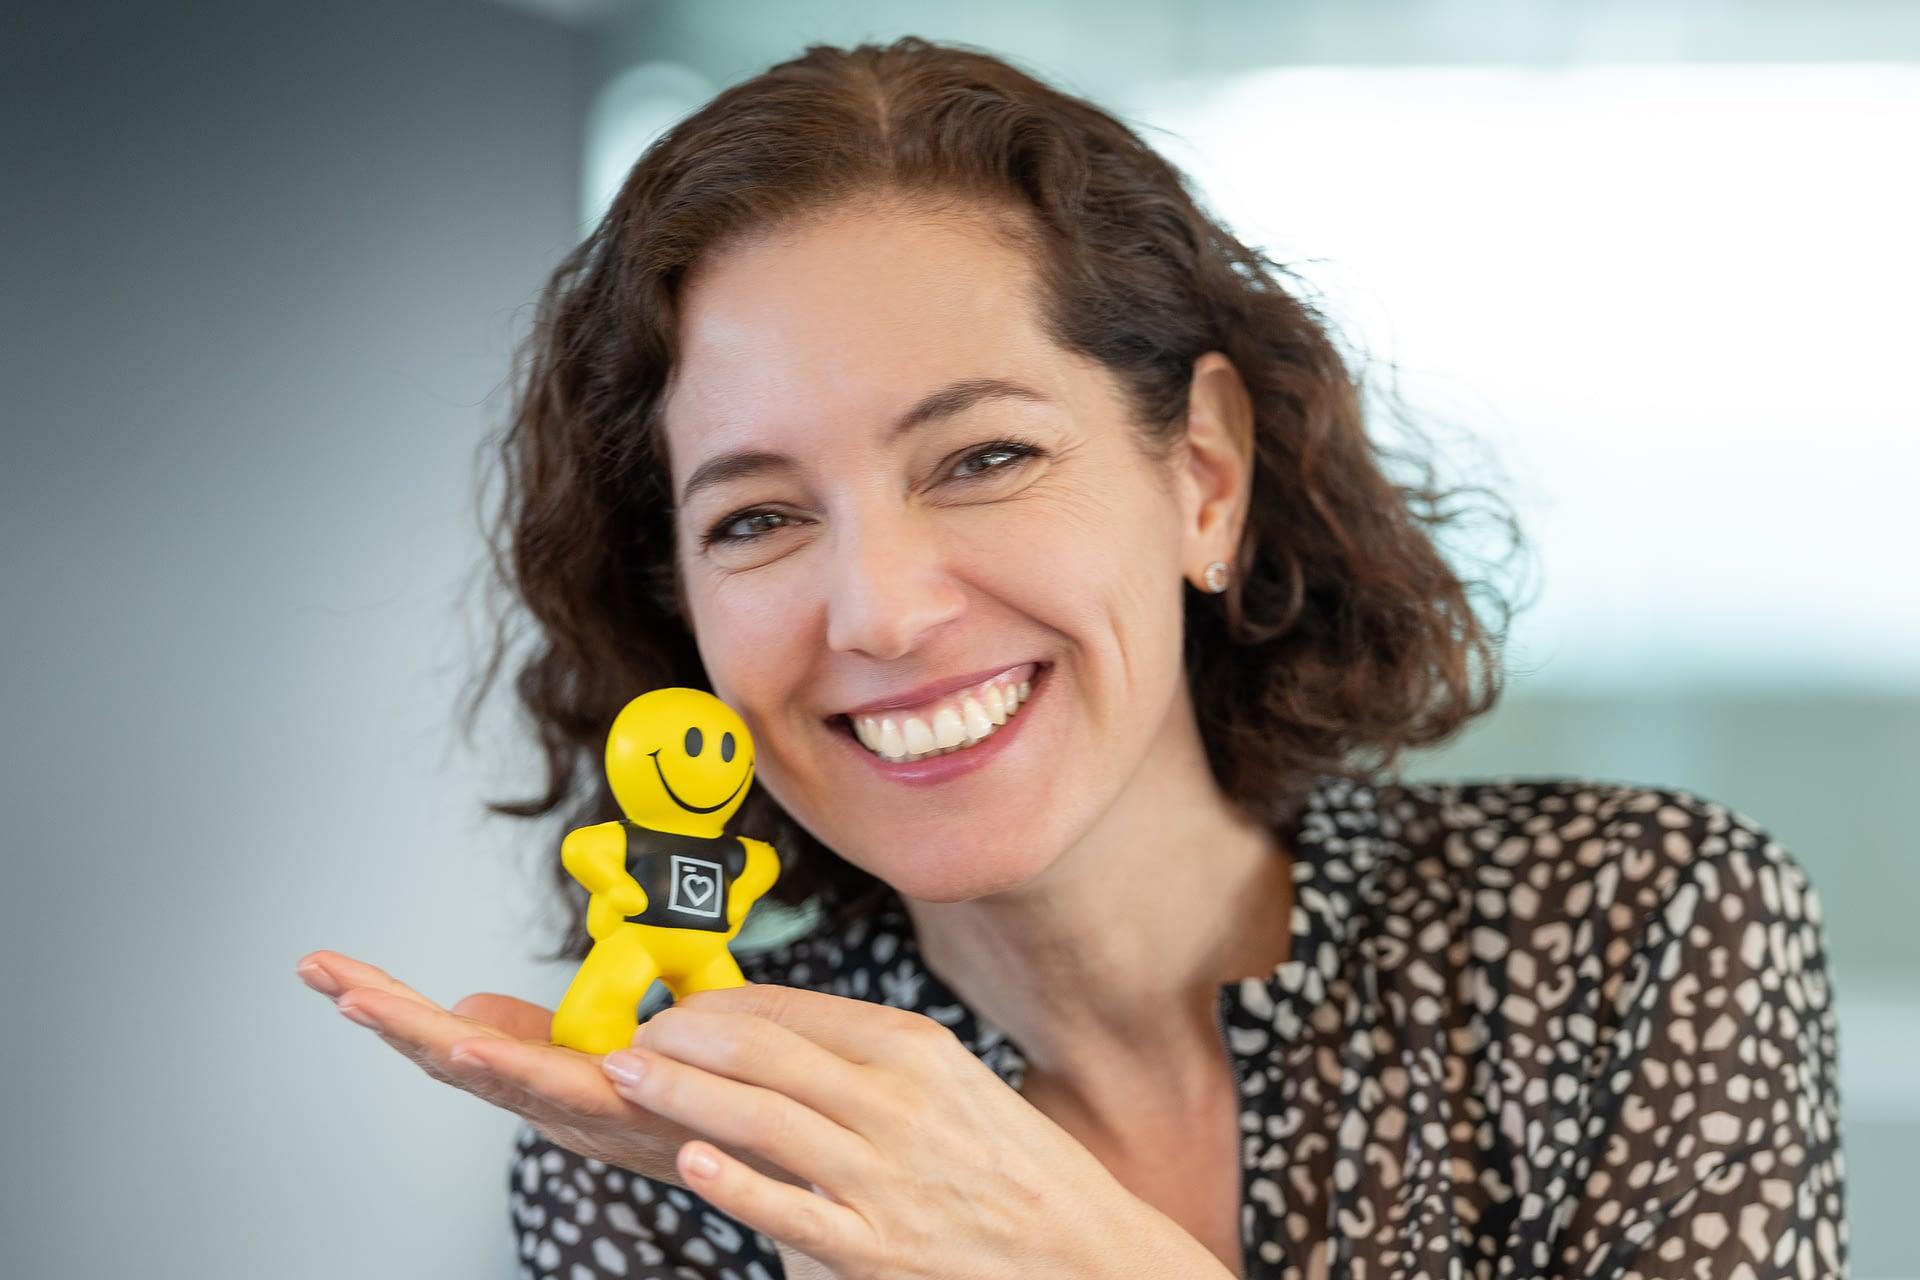 Smile ... Groupe E Portrait Nathalie Salamin by STEMUTZ, Plexus, 05.12.201